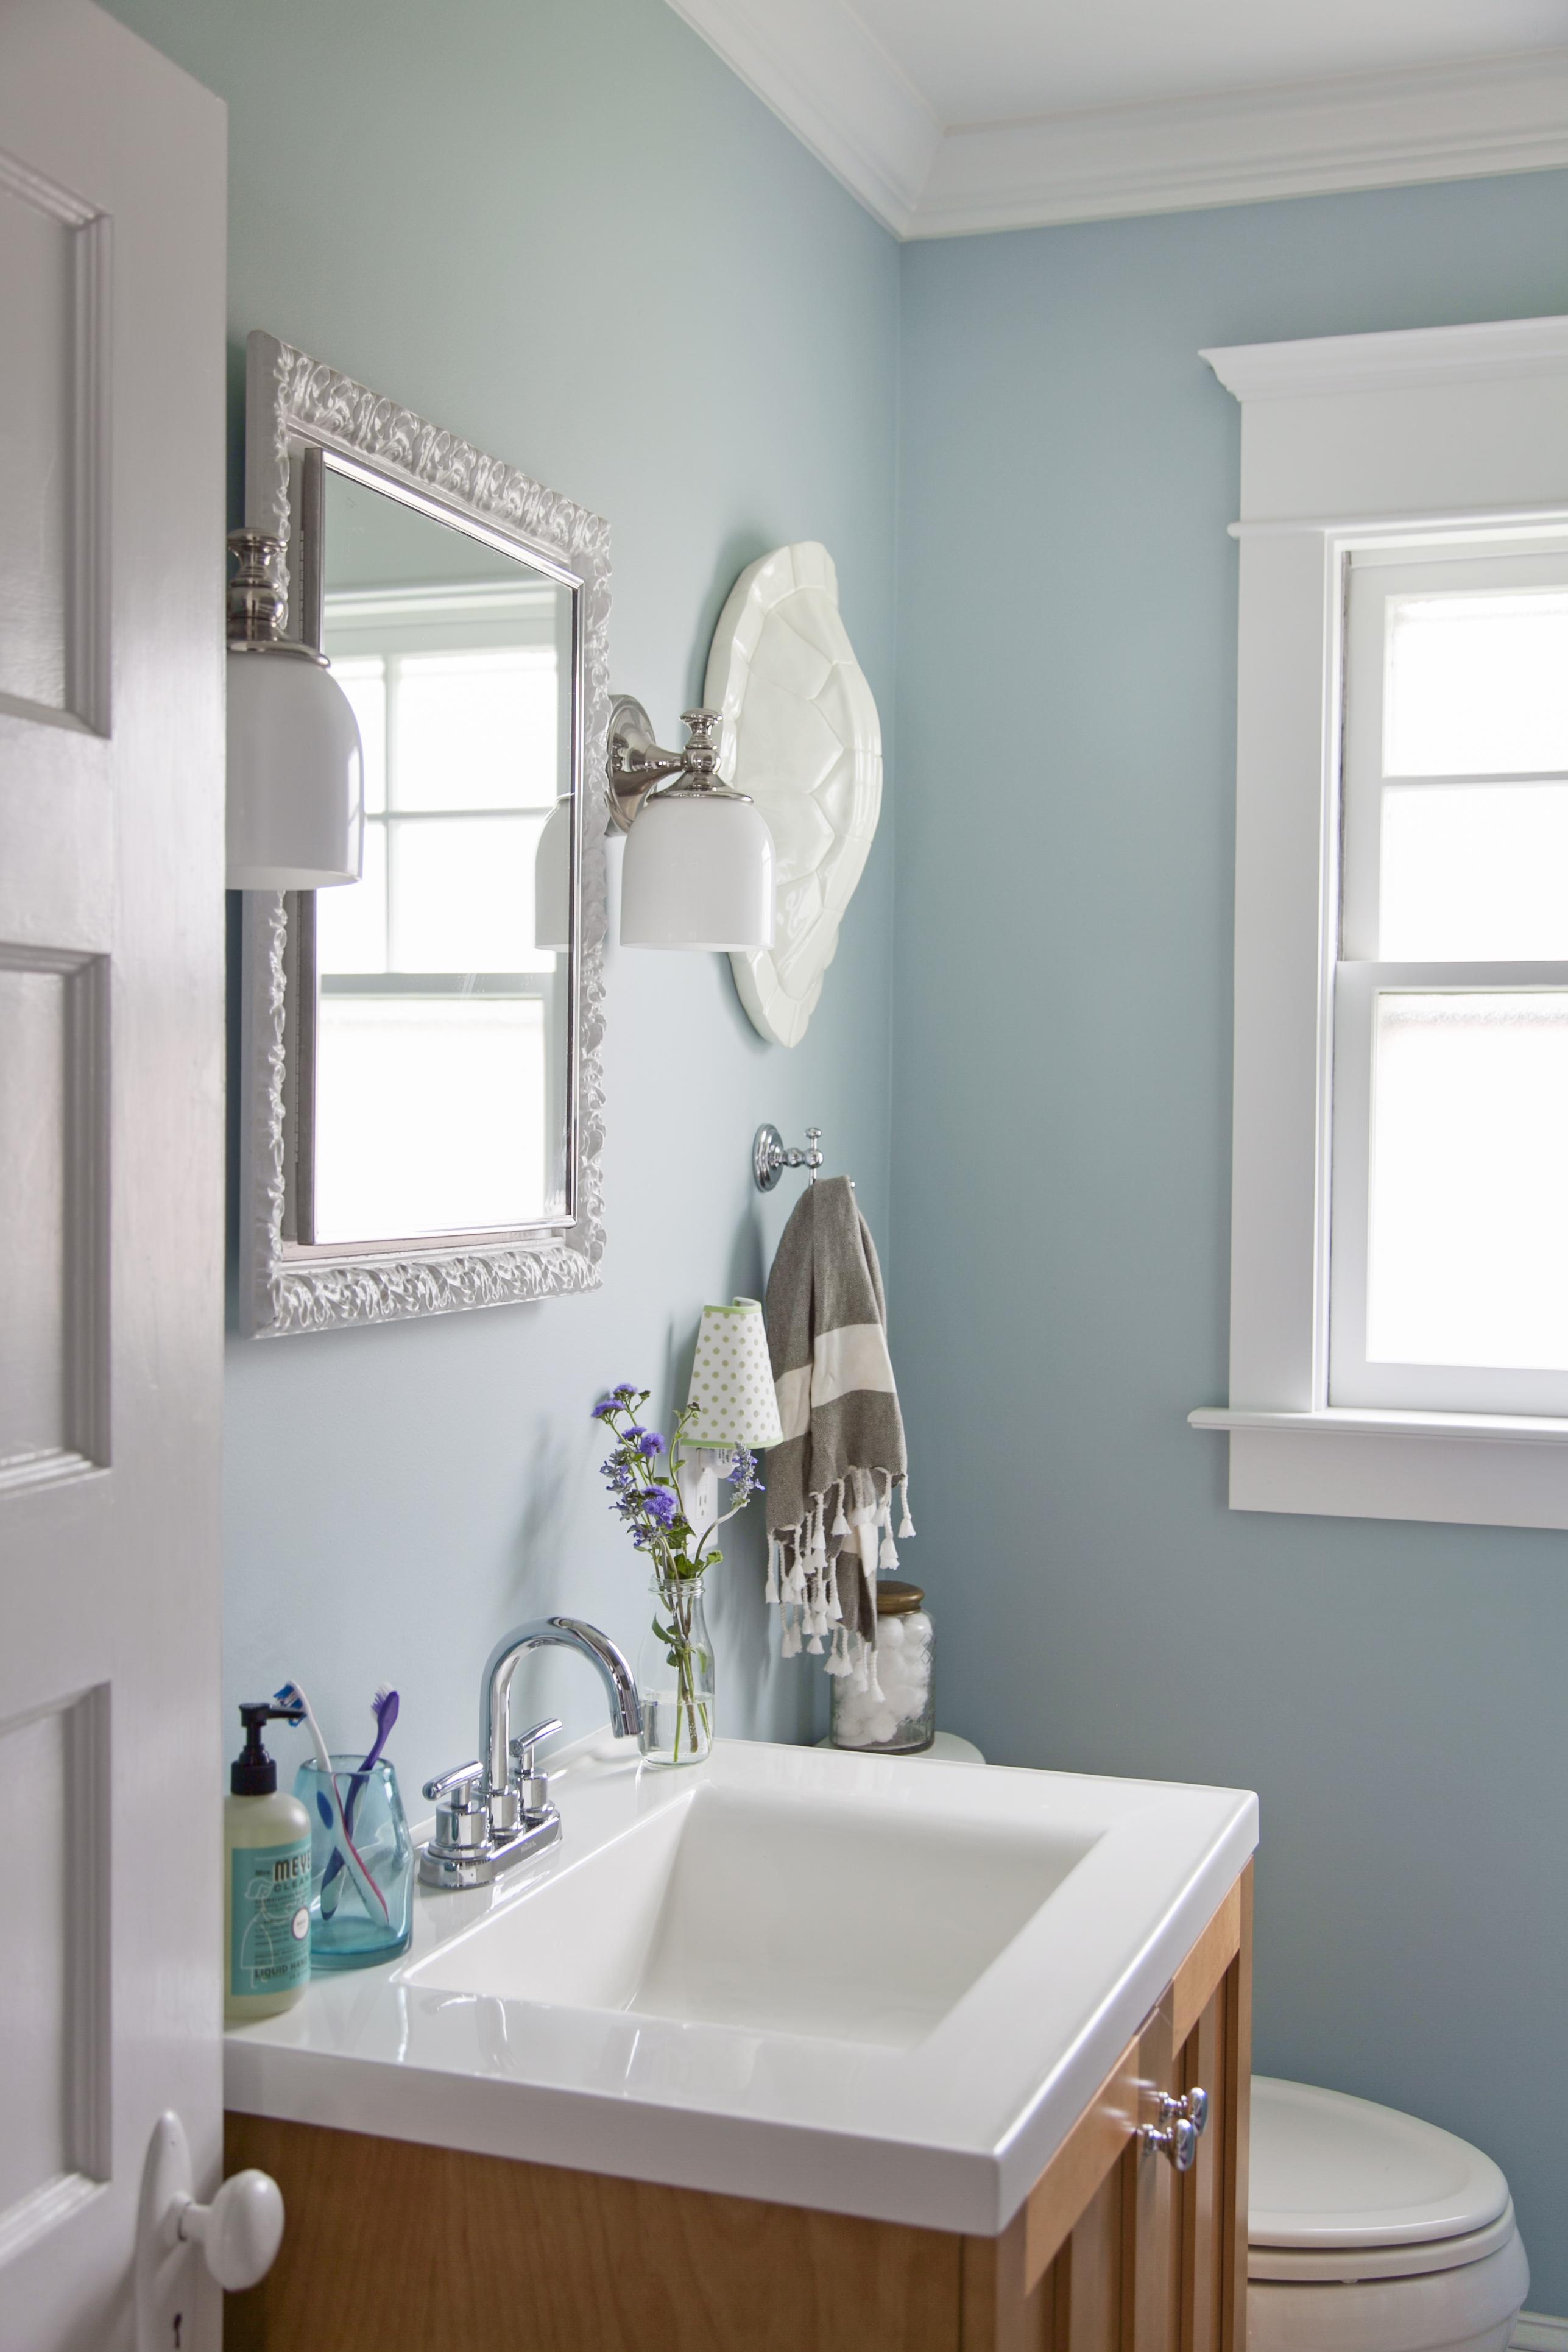 Design Sponge Bathrooms Gallery Trg Home Concepts